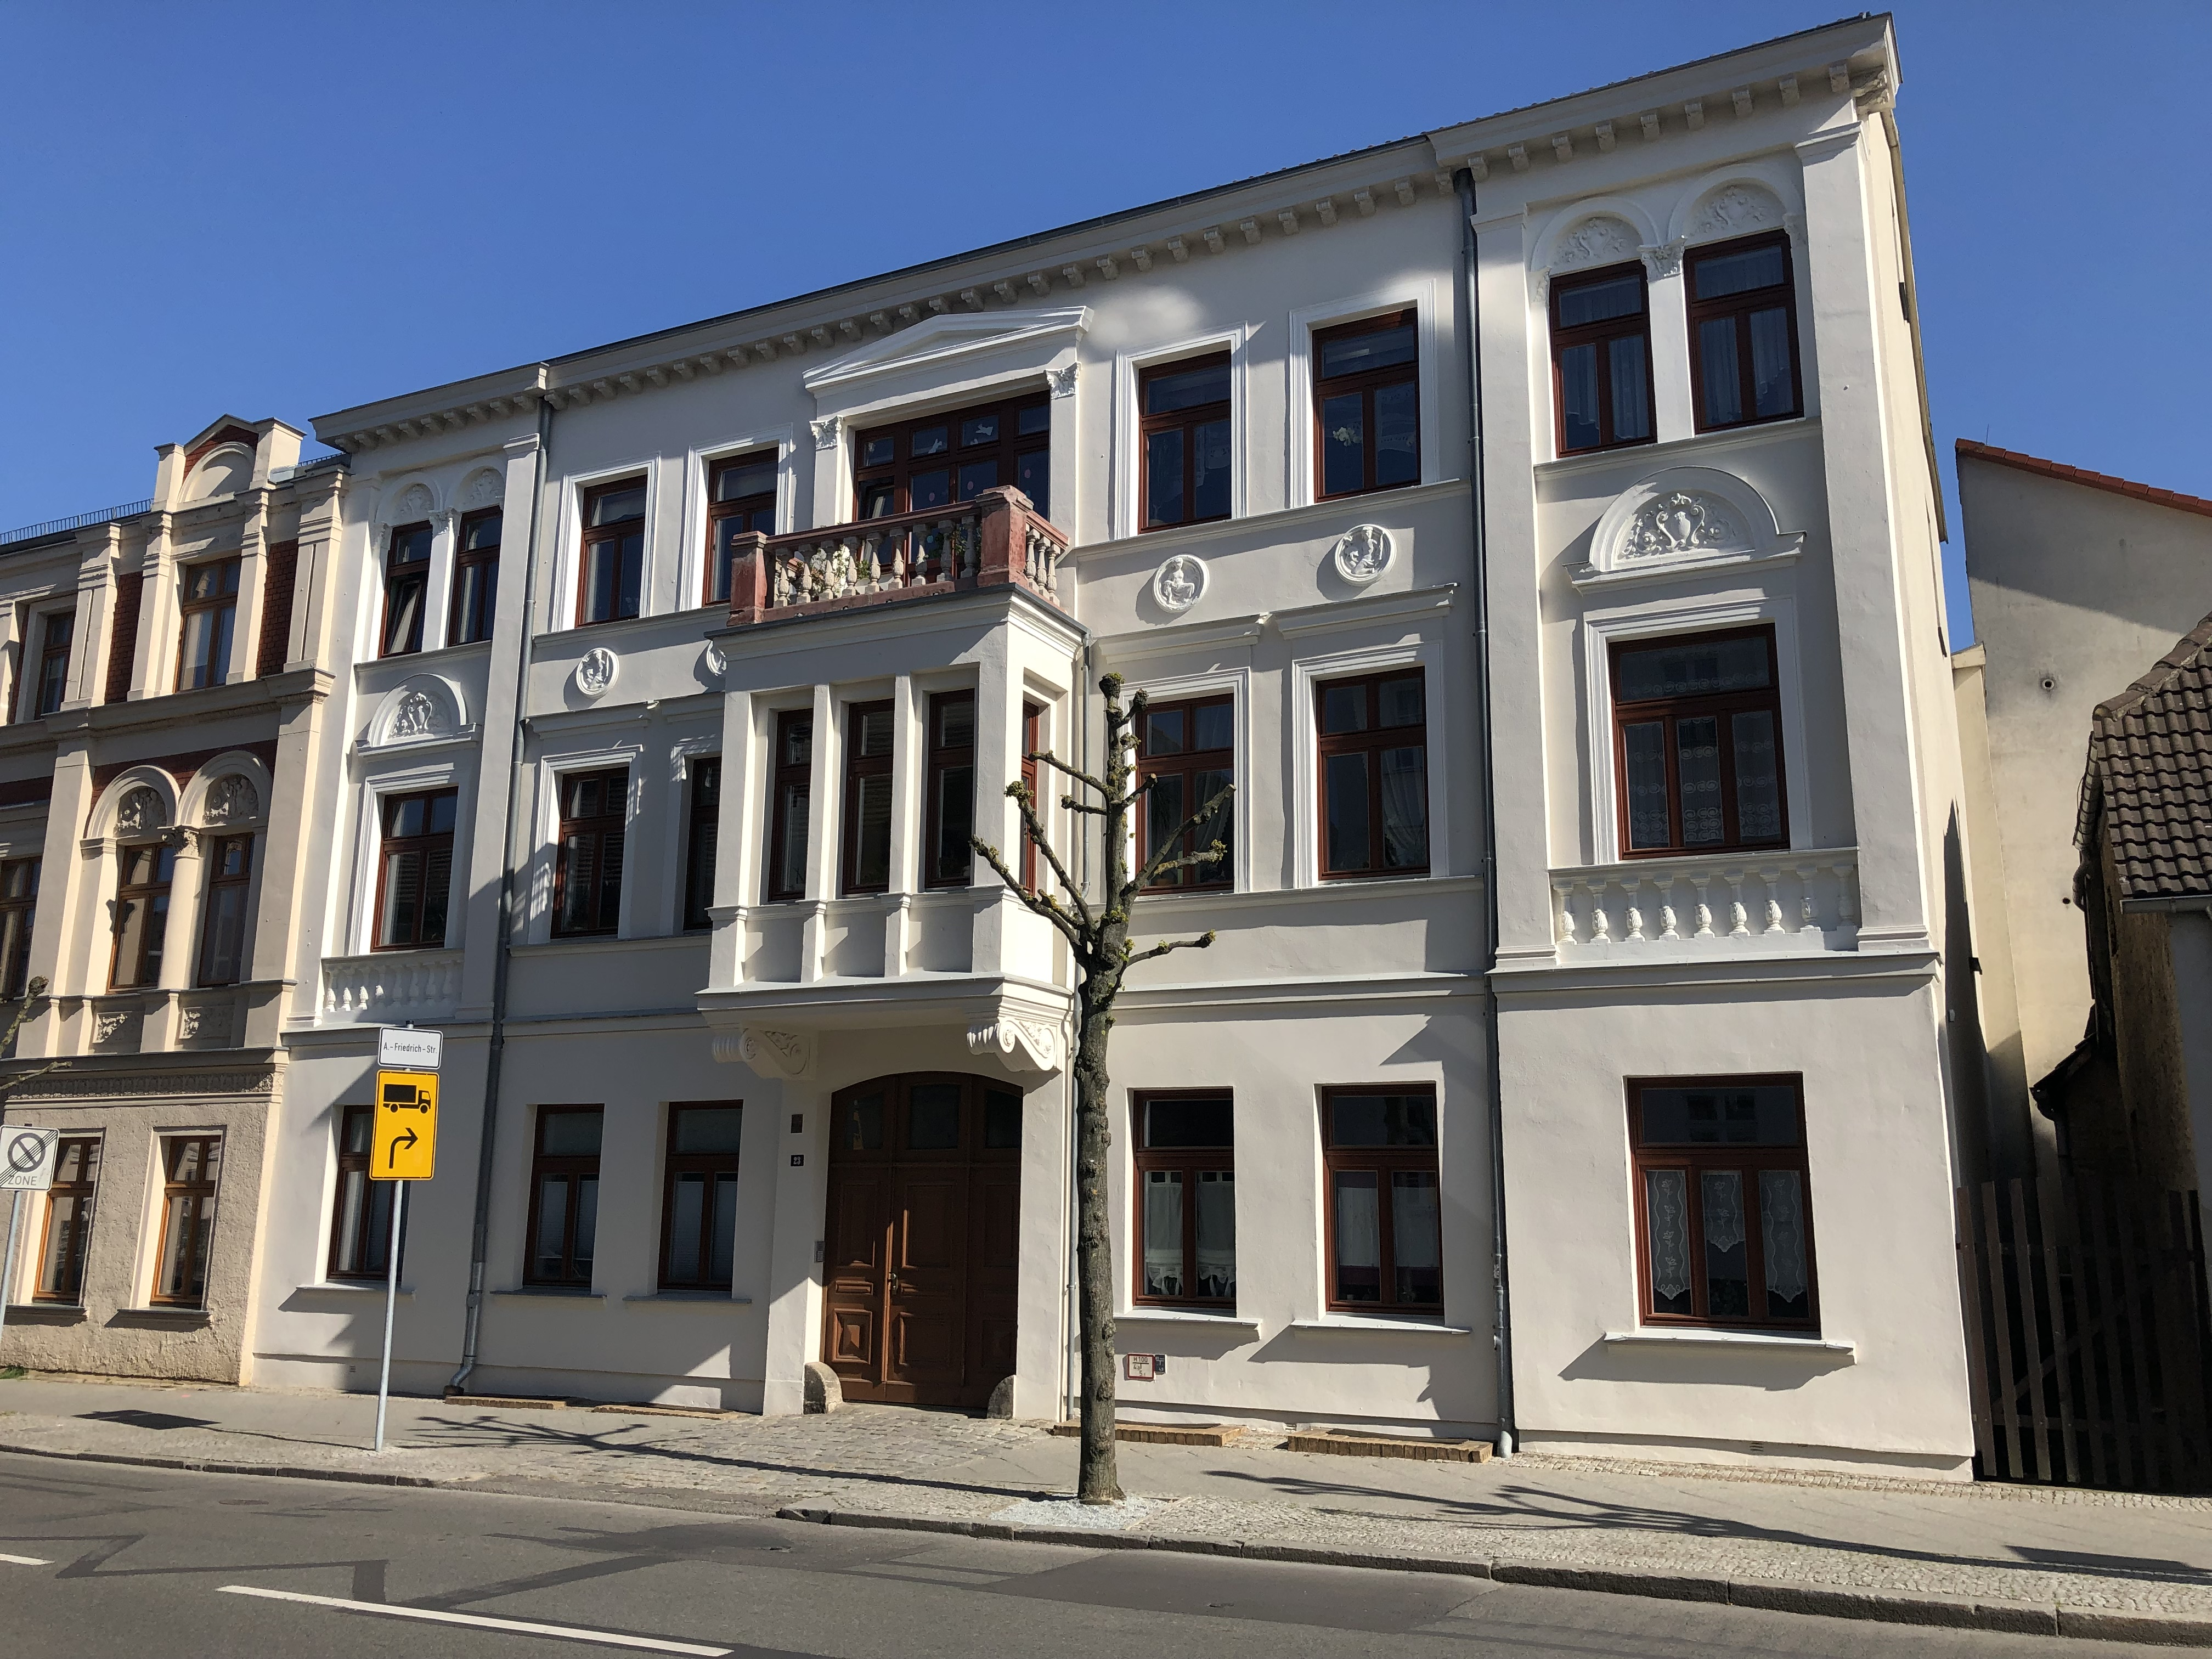 Glambecker Straße 23